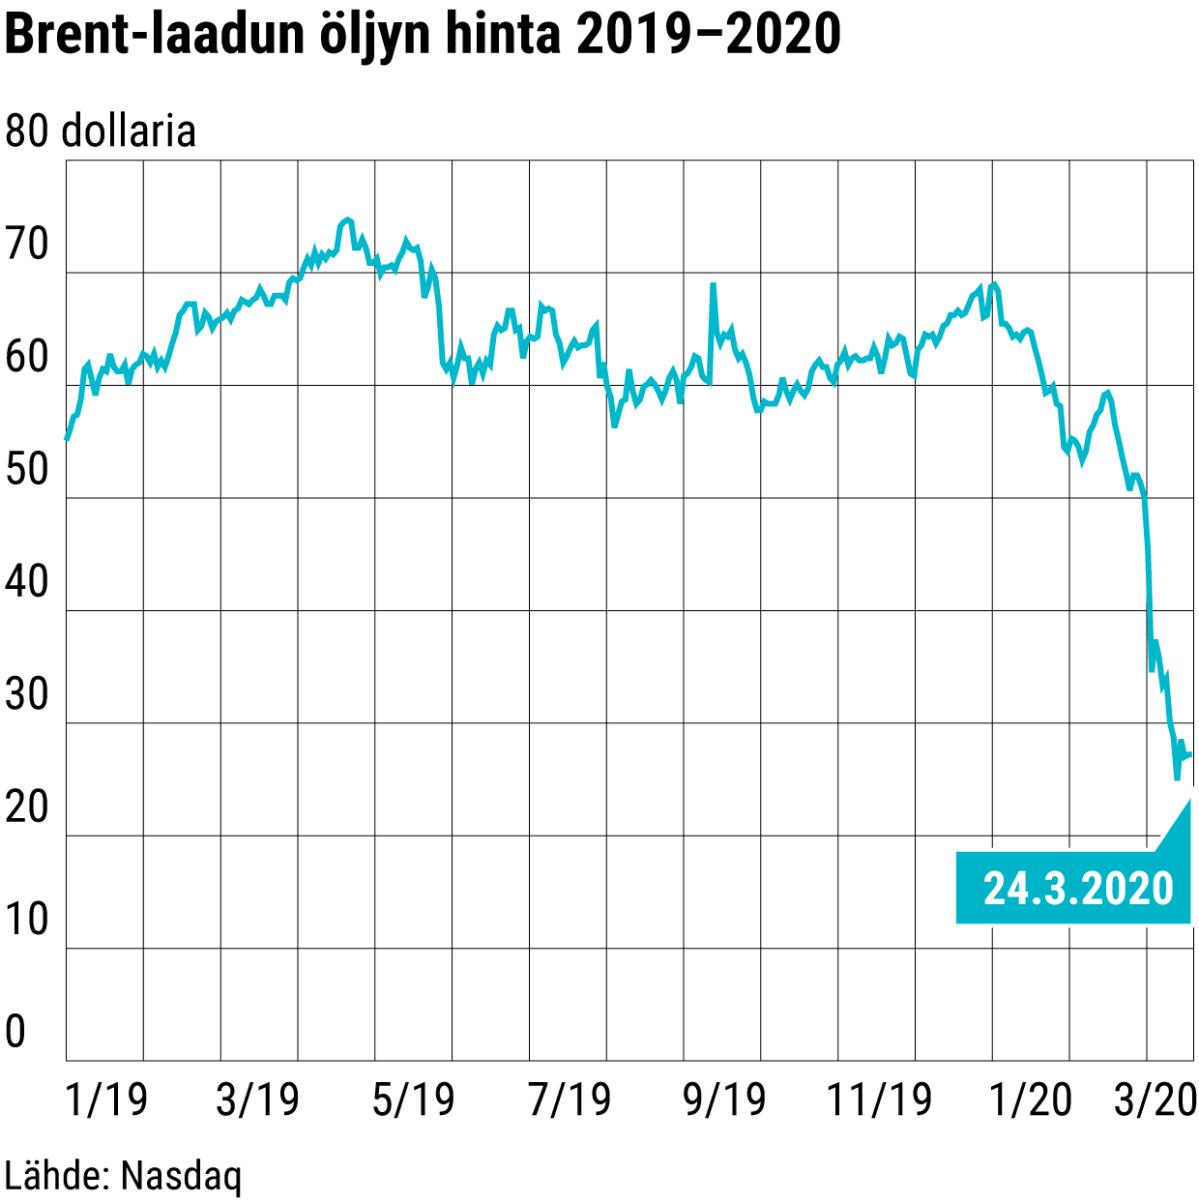 Brent-laadun öljyn hinta 2019–2020